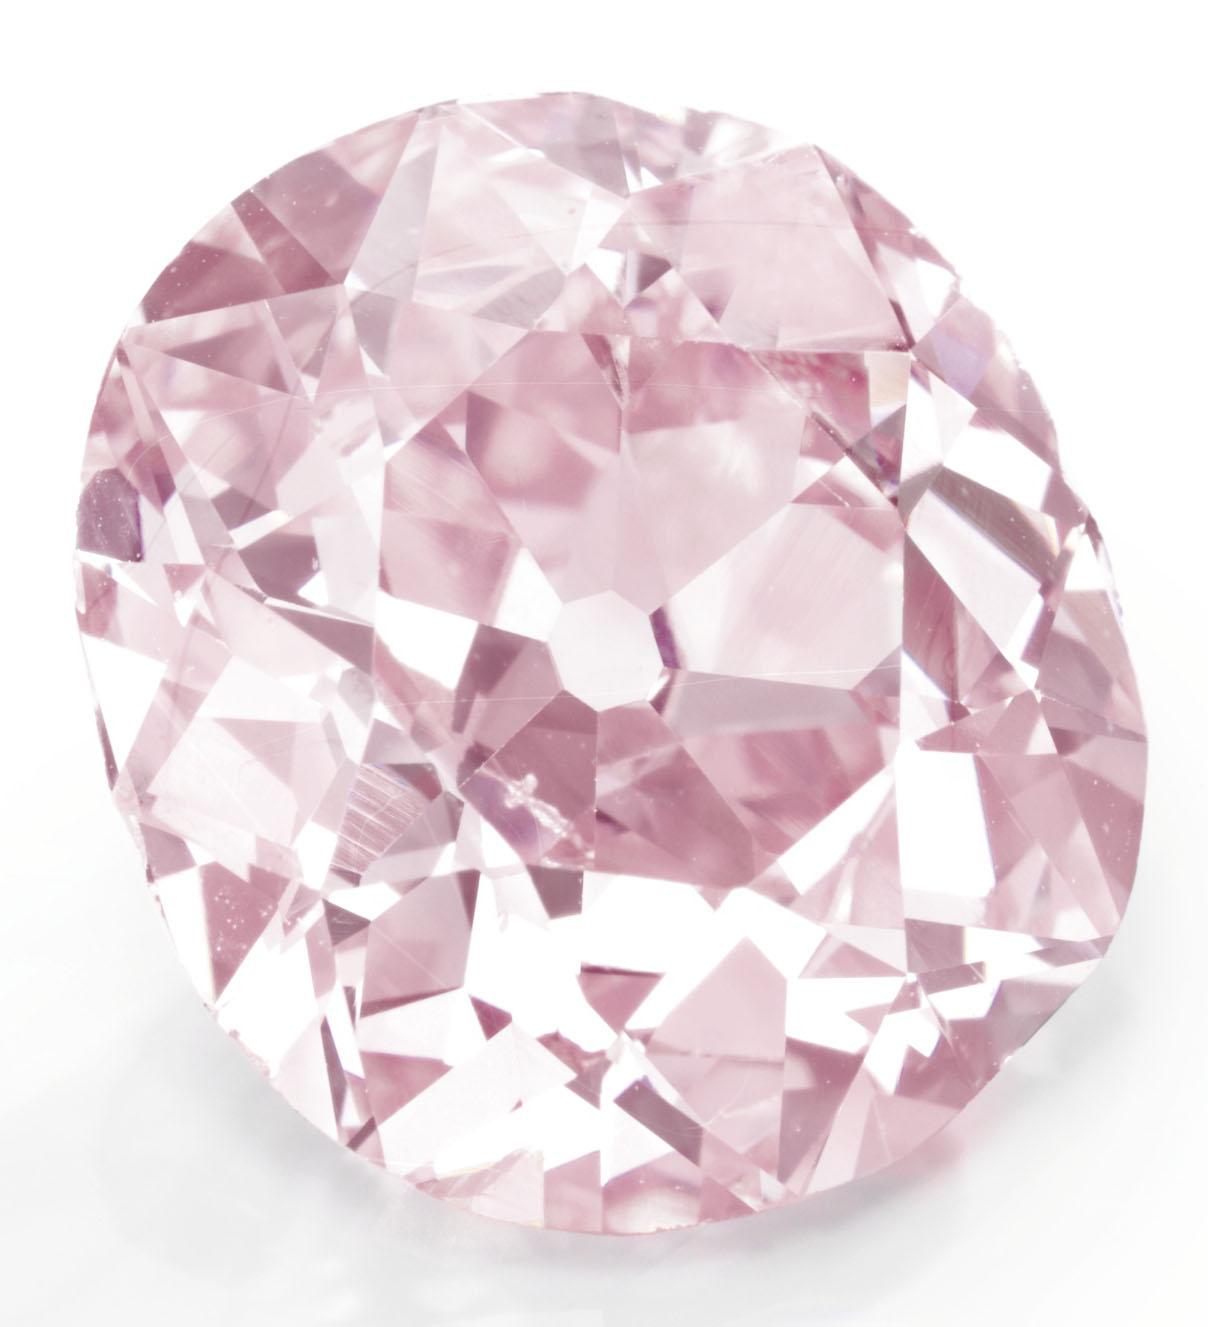 The 9 ct belle epoque cushion cut fancy vivid purplish pink diamond